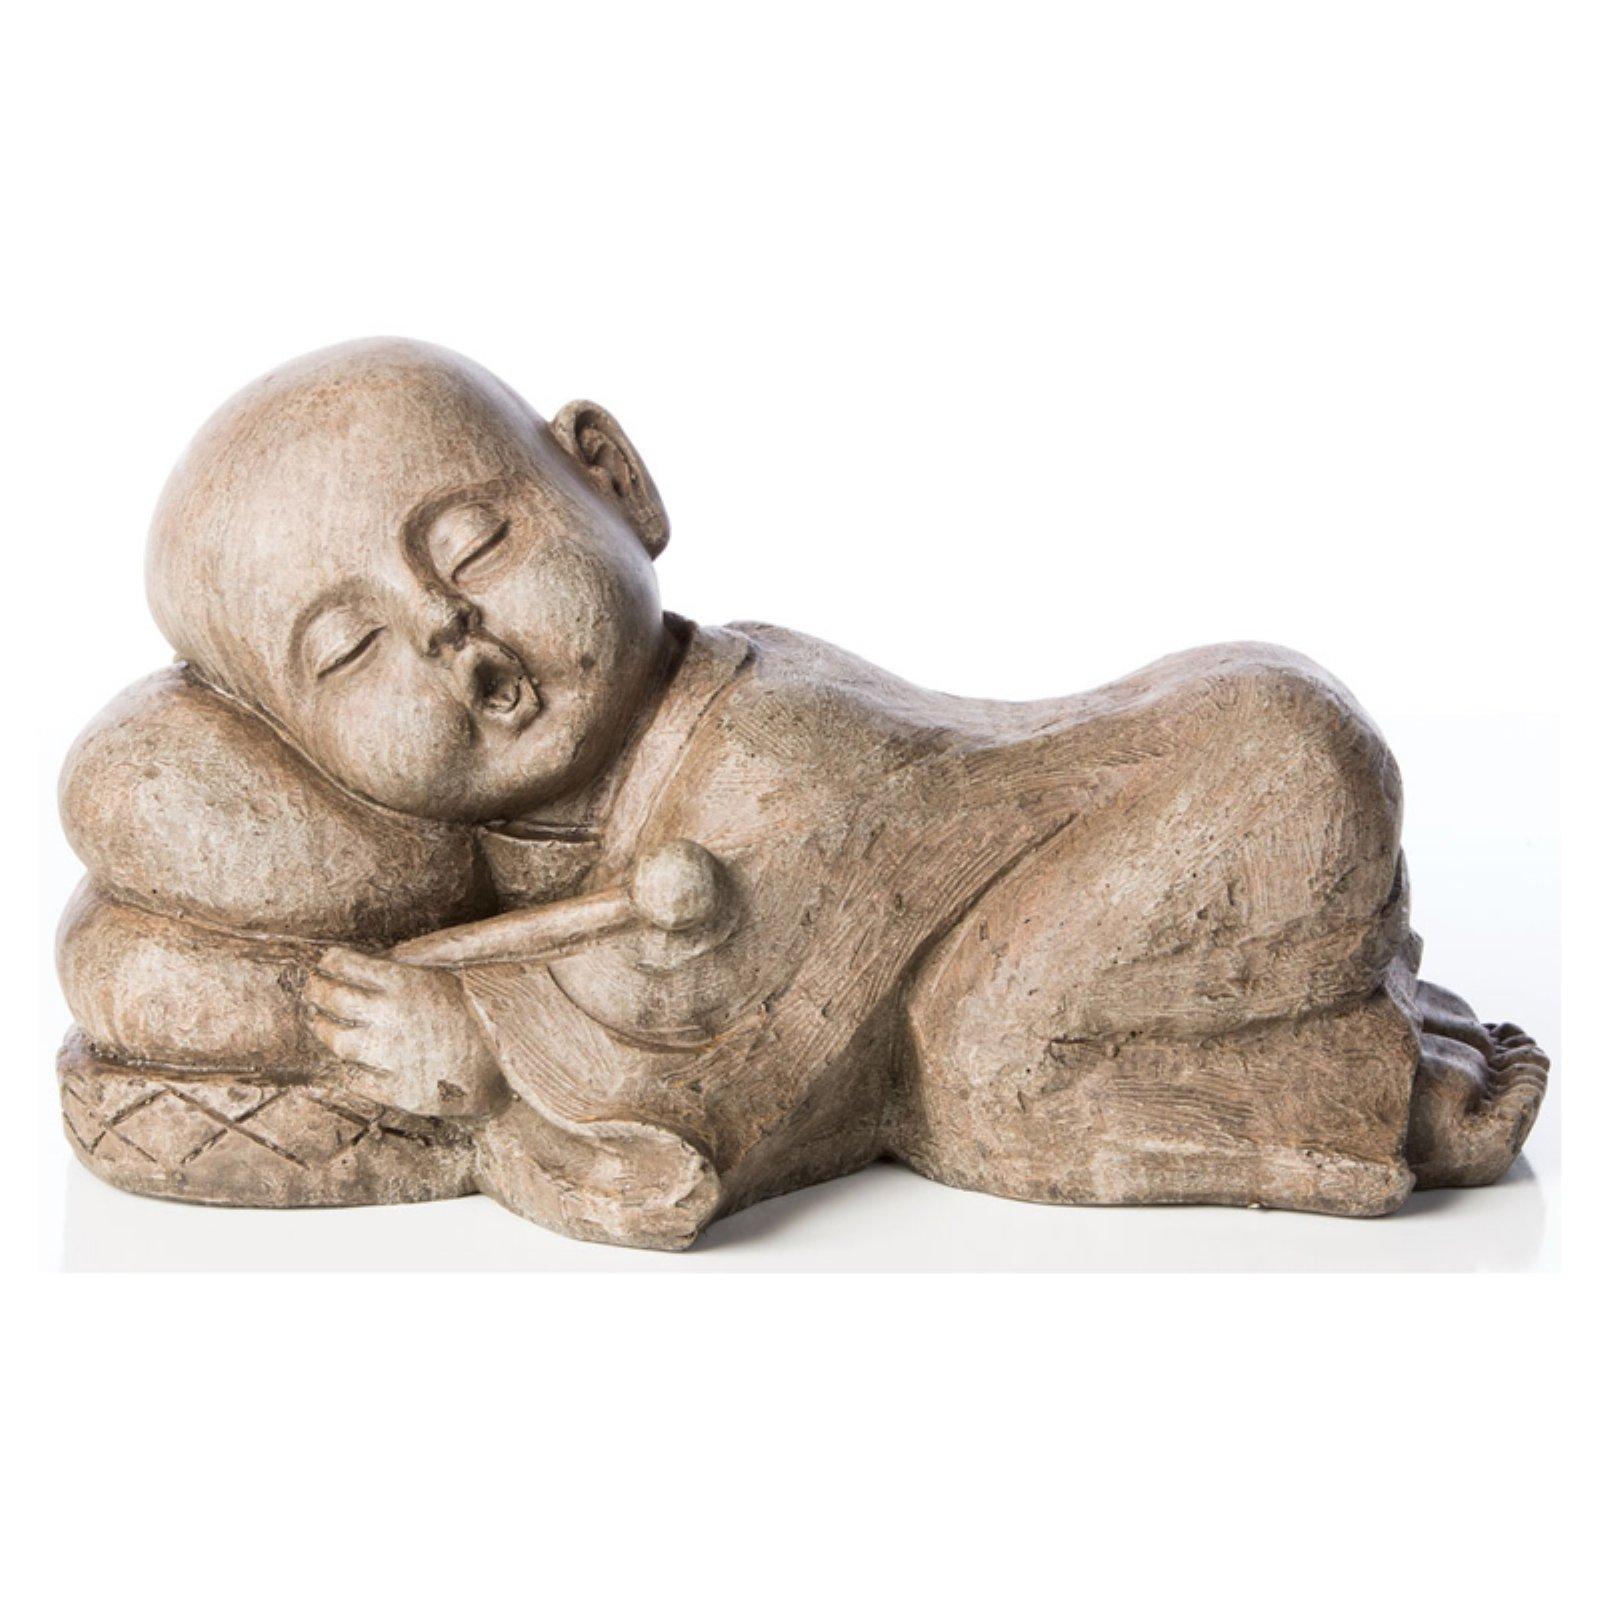 Alfresco Home Sleepy Drummer Buddha Garden Statue